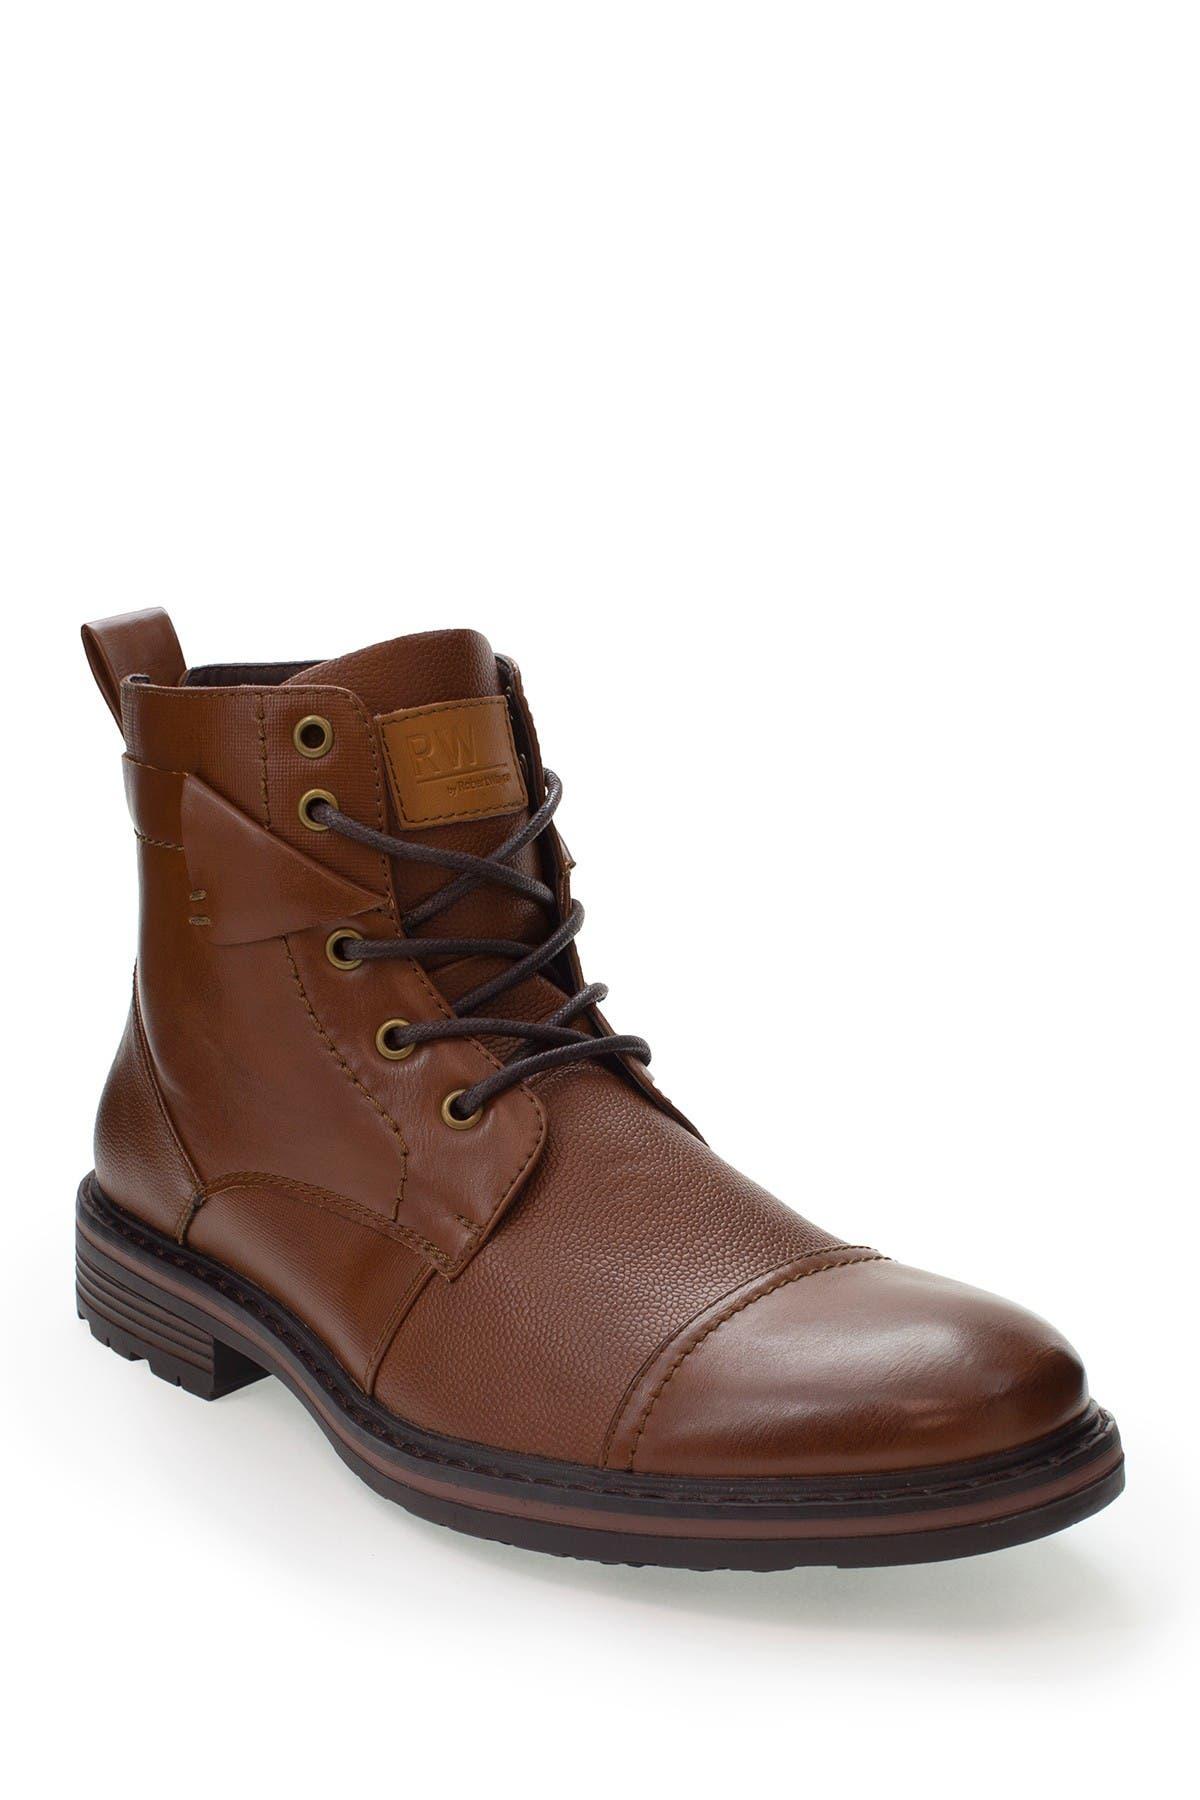 Image of Robert Wayne Jefferson Boot